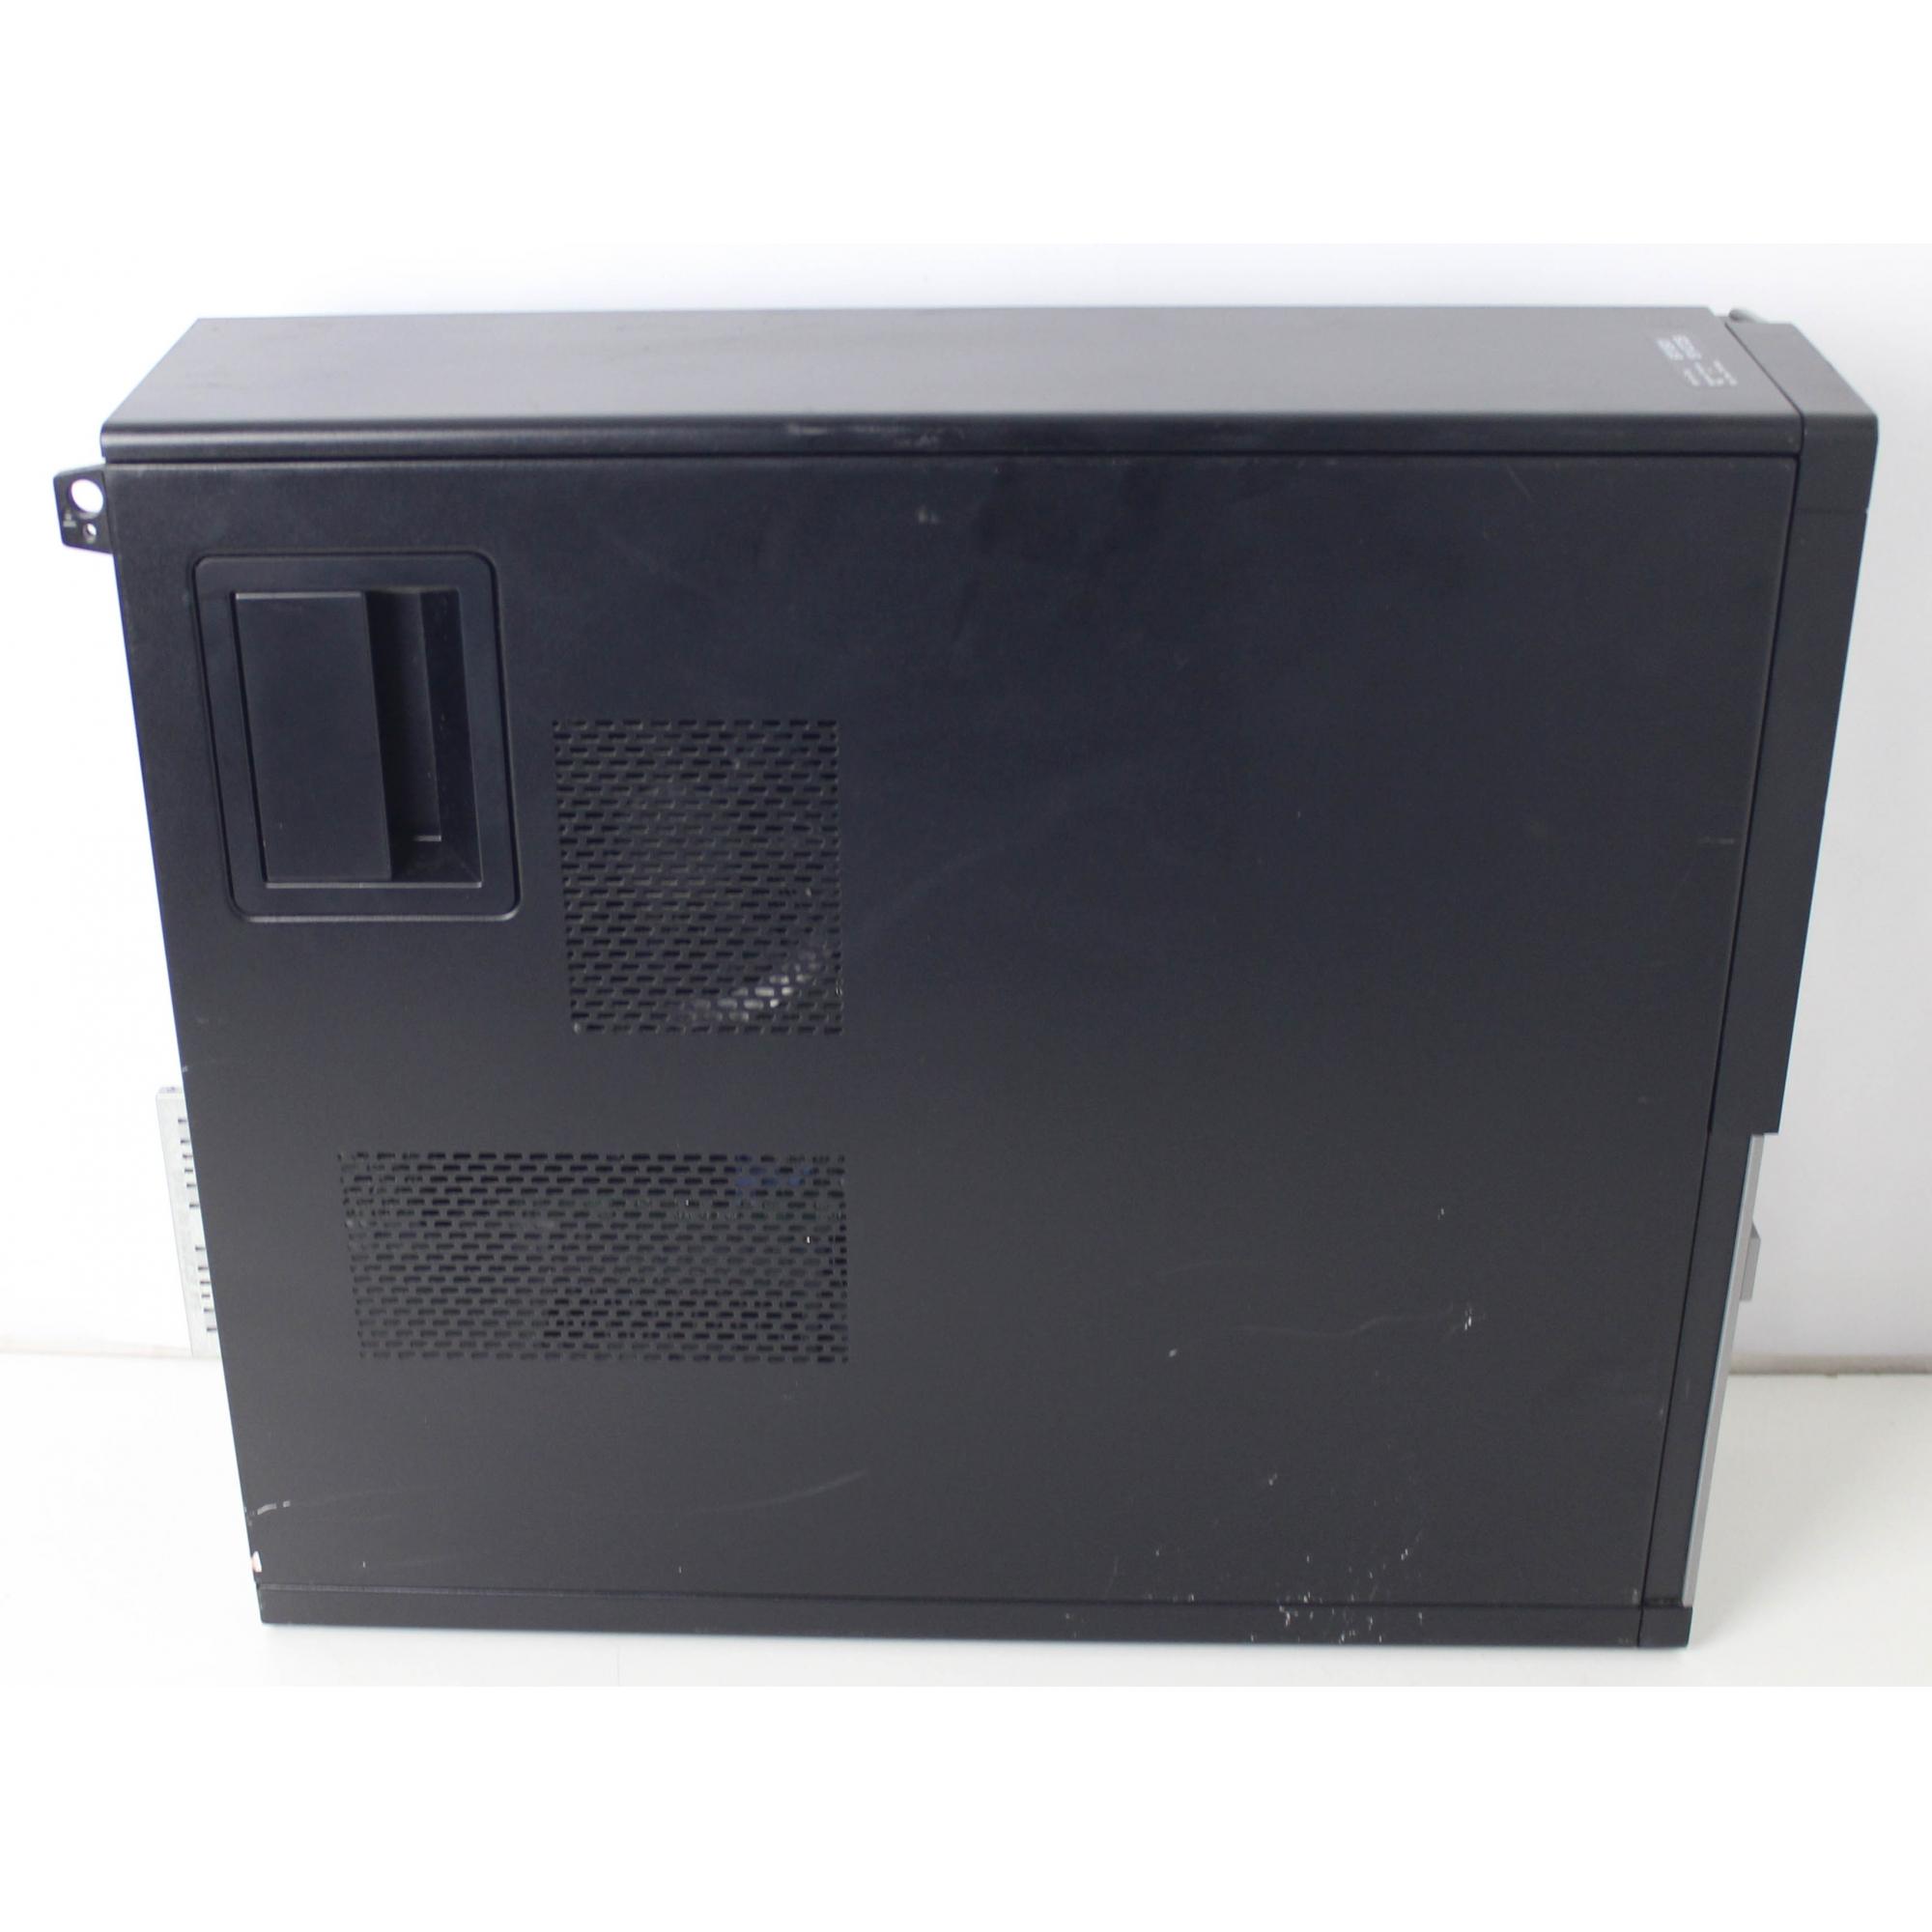 CPU Dell Optiplex 7010 Intel Core i5 3.4GHz 4GB HD-500GB